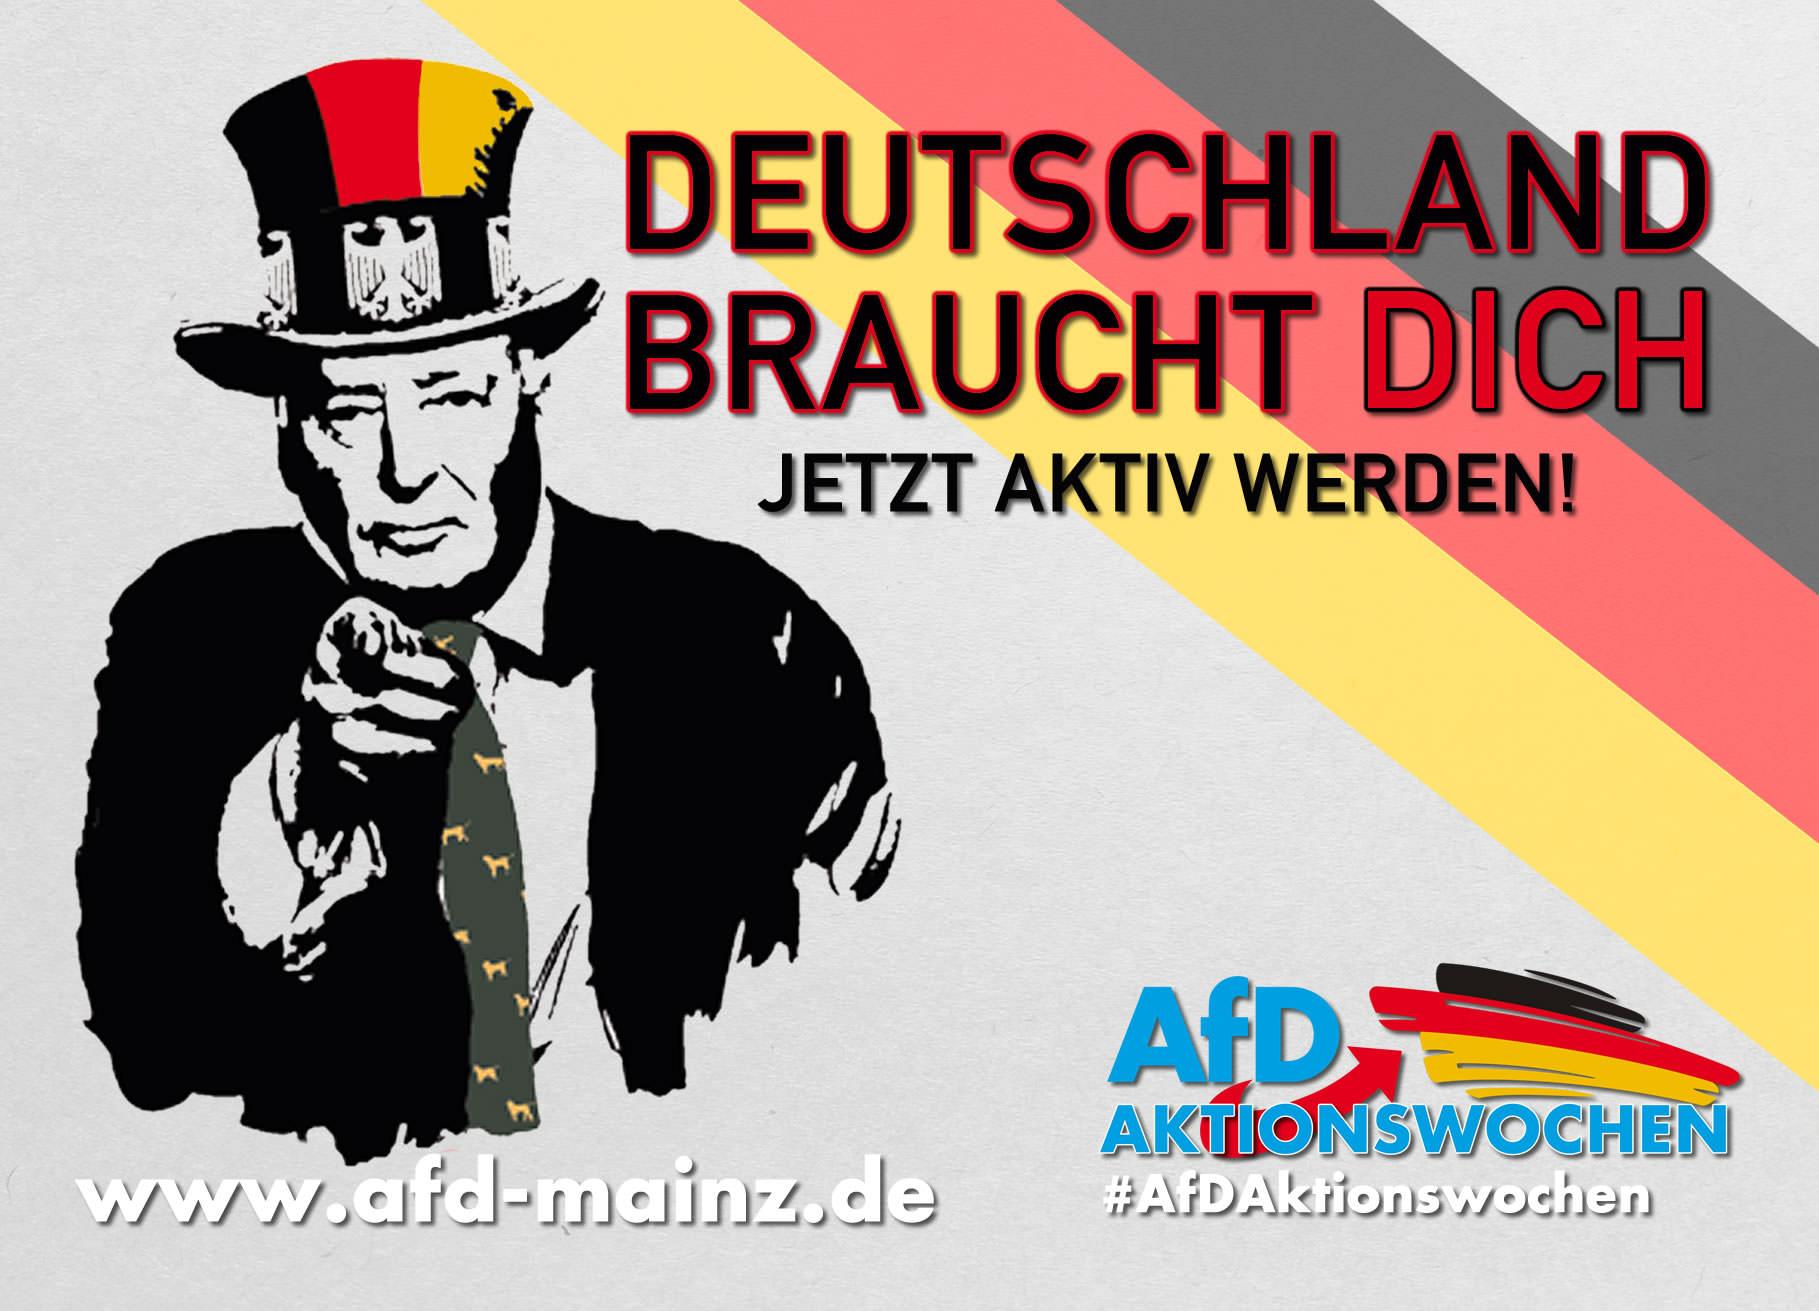 AfD Aktionswochen